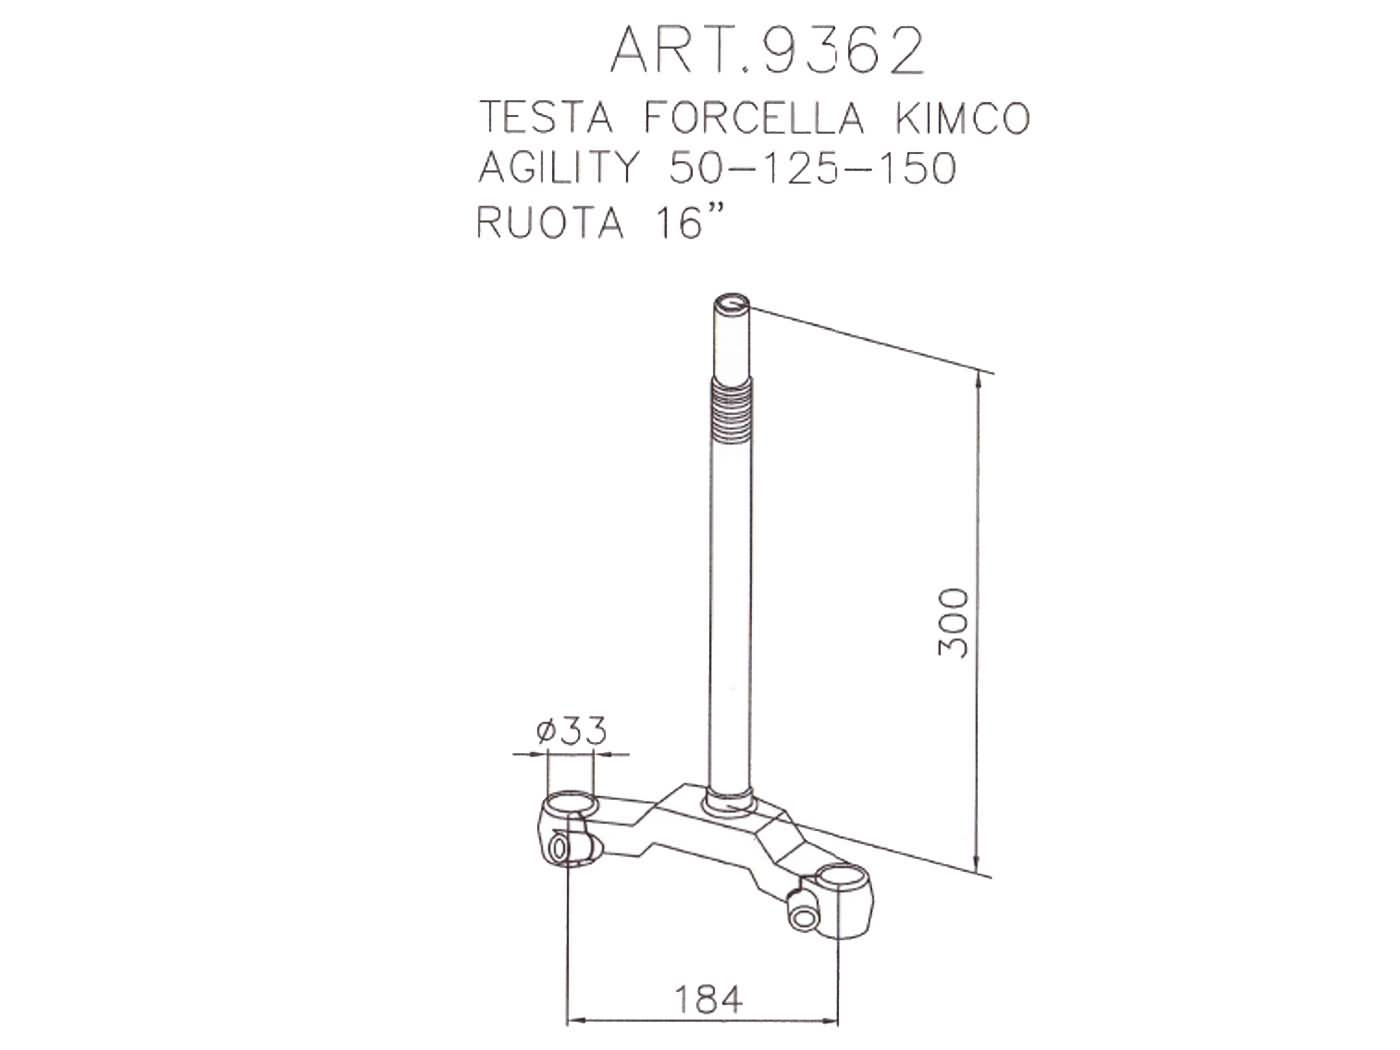 fork yoke / yoke steering stem assy Buzzetti for Kymco